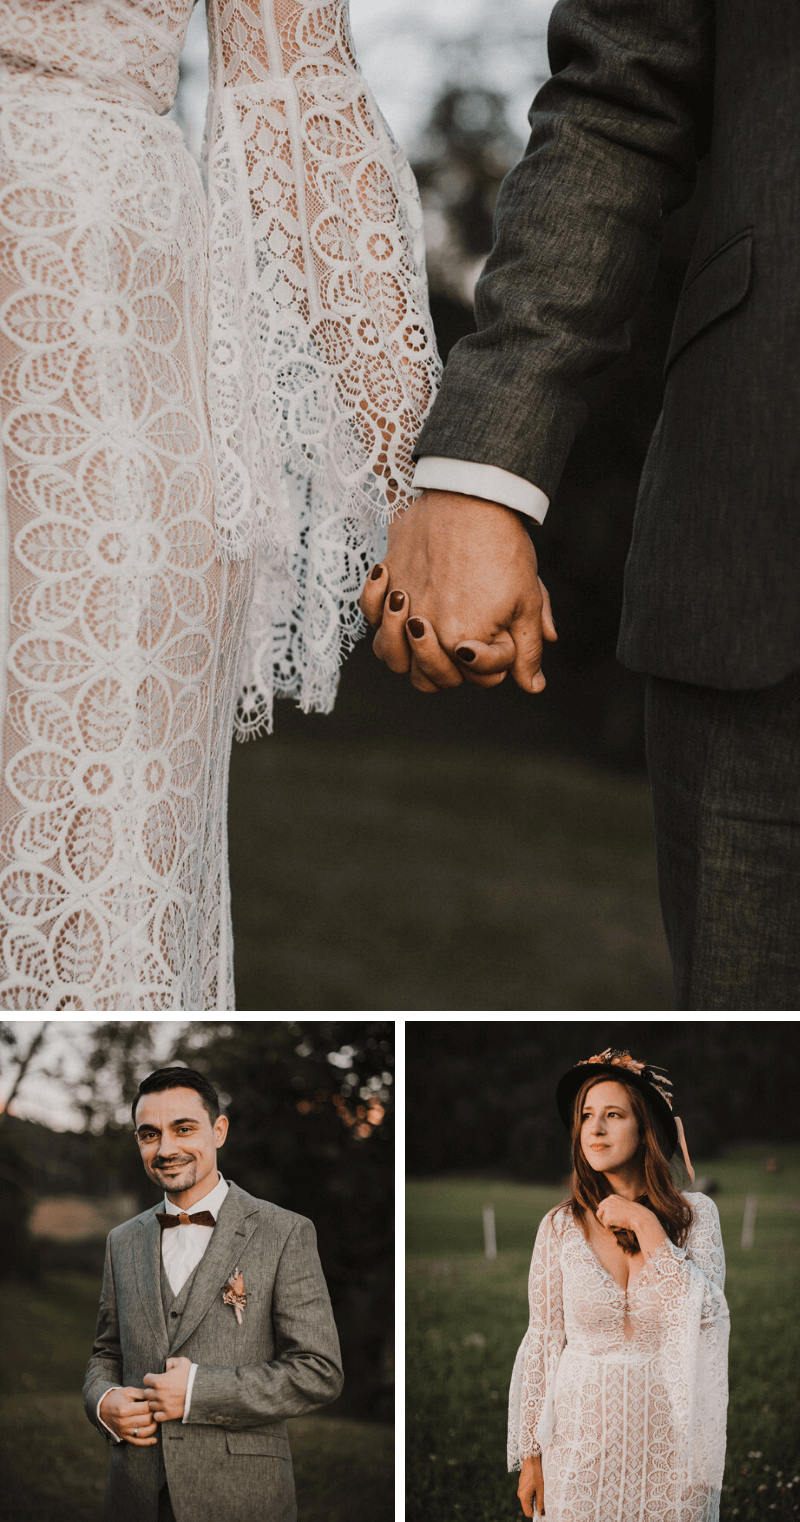 Boho Brautpaarshooting, Hochzeitsfotos Ideen